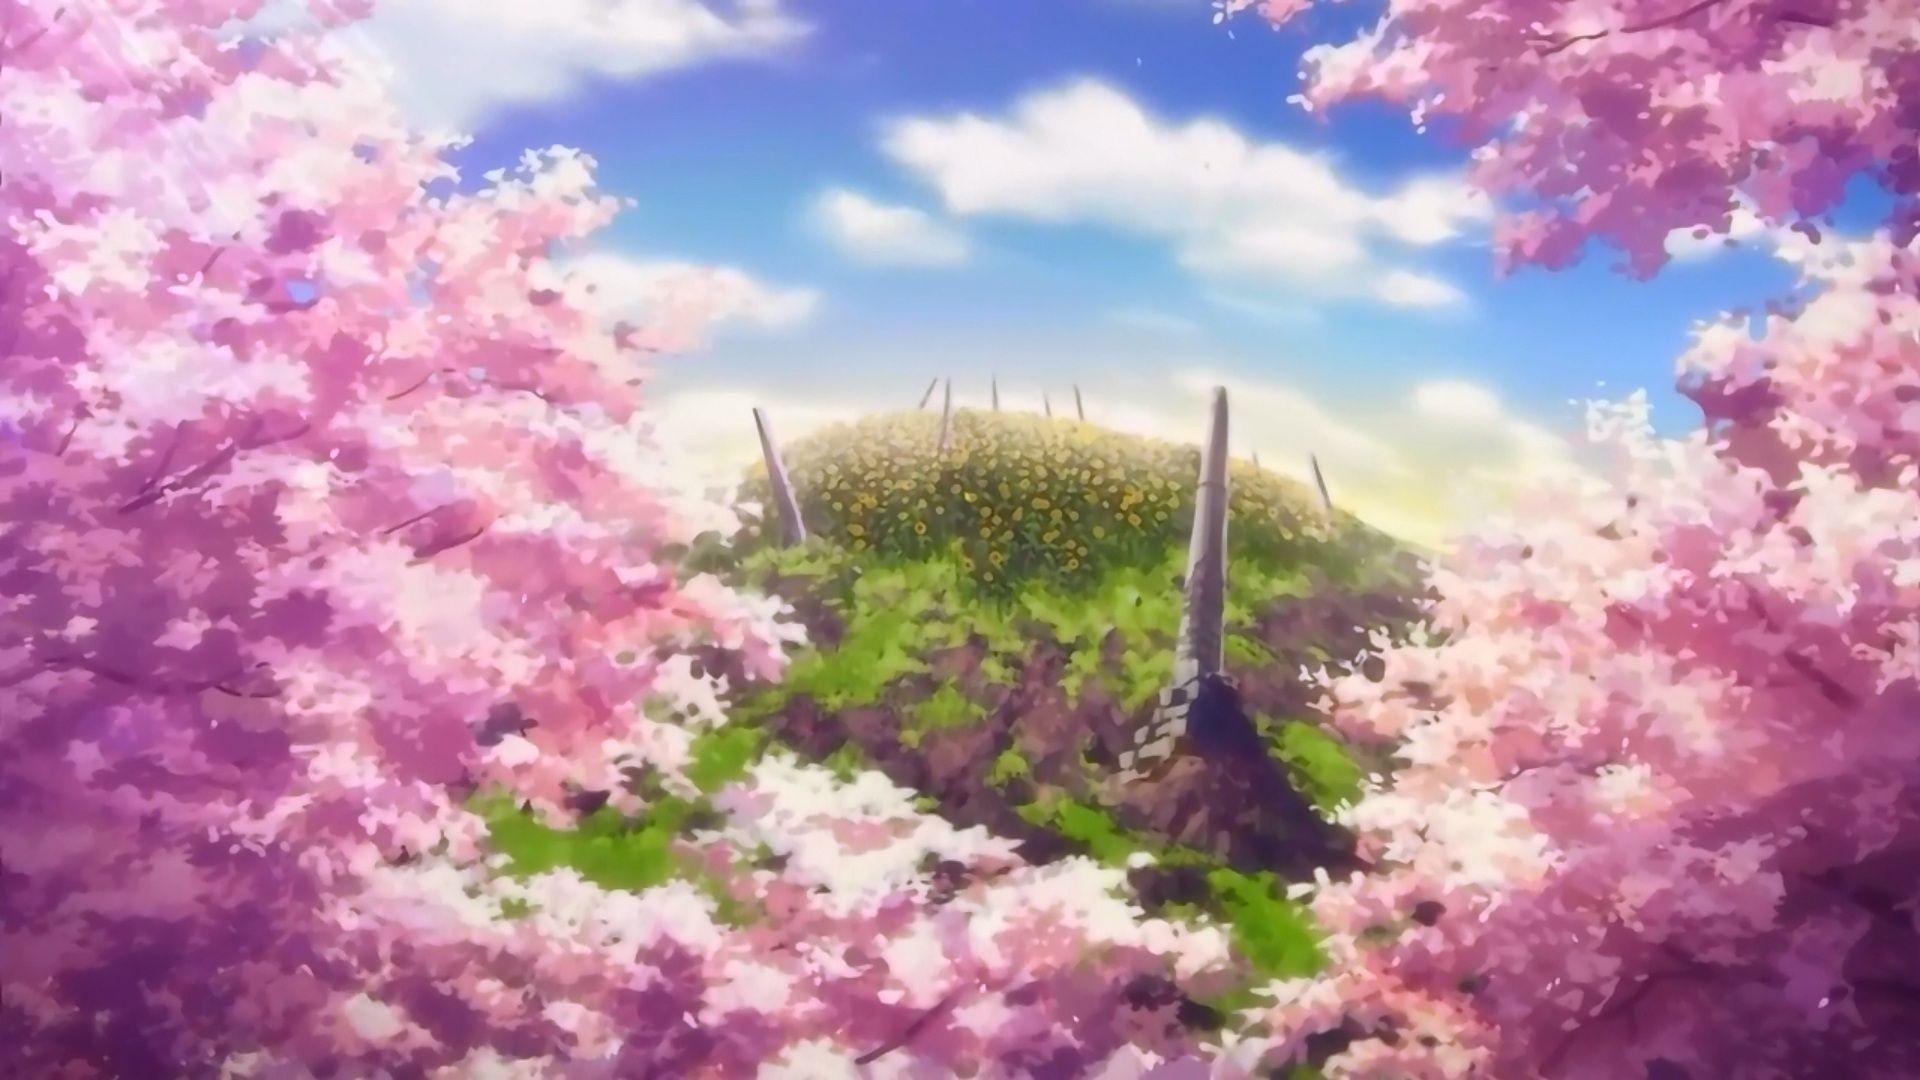 Beautiful Anime Landscapes Imgur Anime Scenery Anime Cherry Blossom Scenery